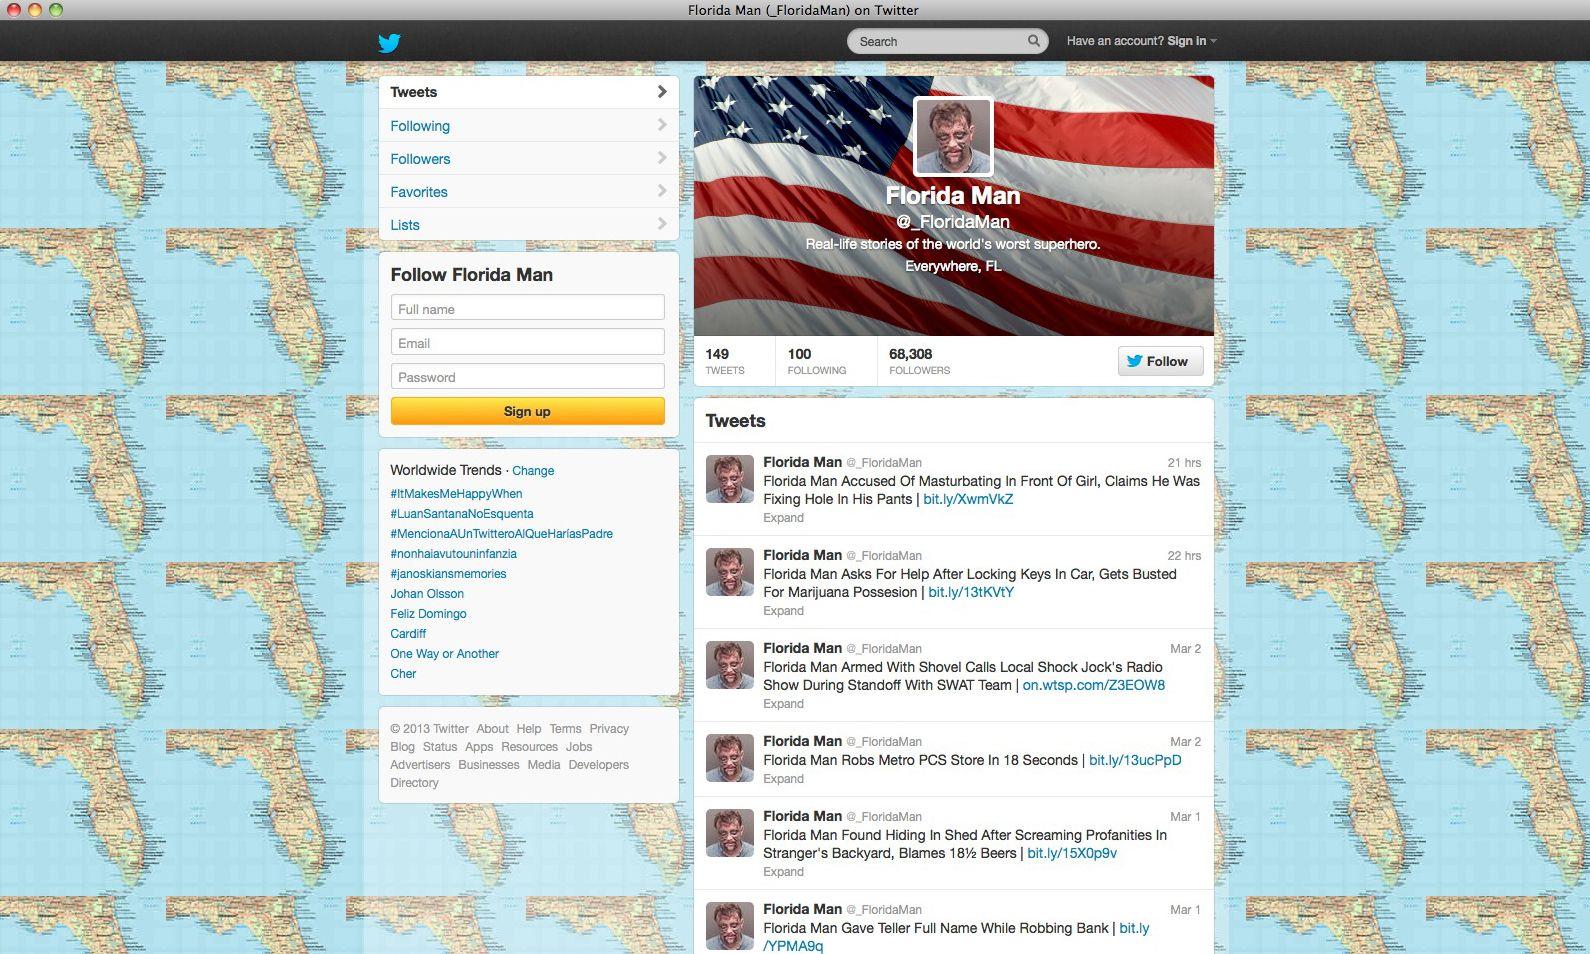 NUR ALS ZITAT Screenshot/ Florida Man/ Twitter